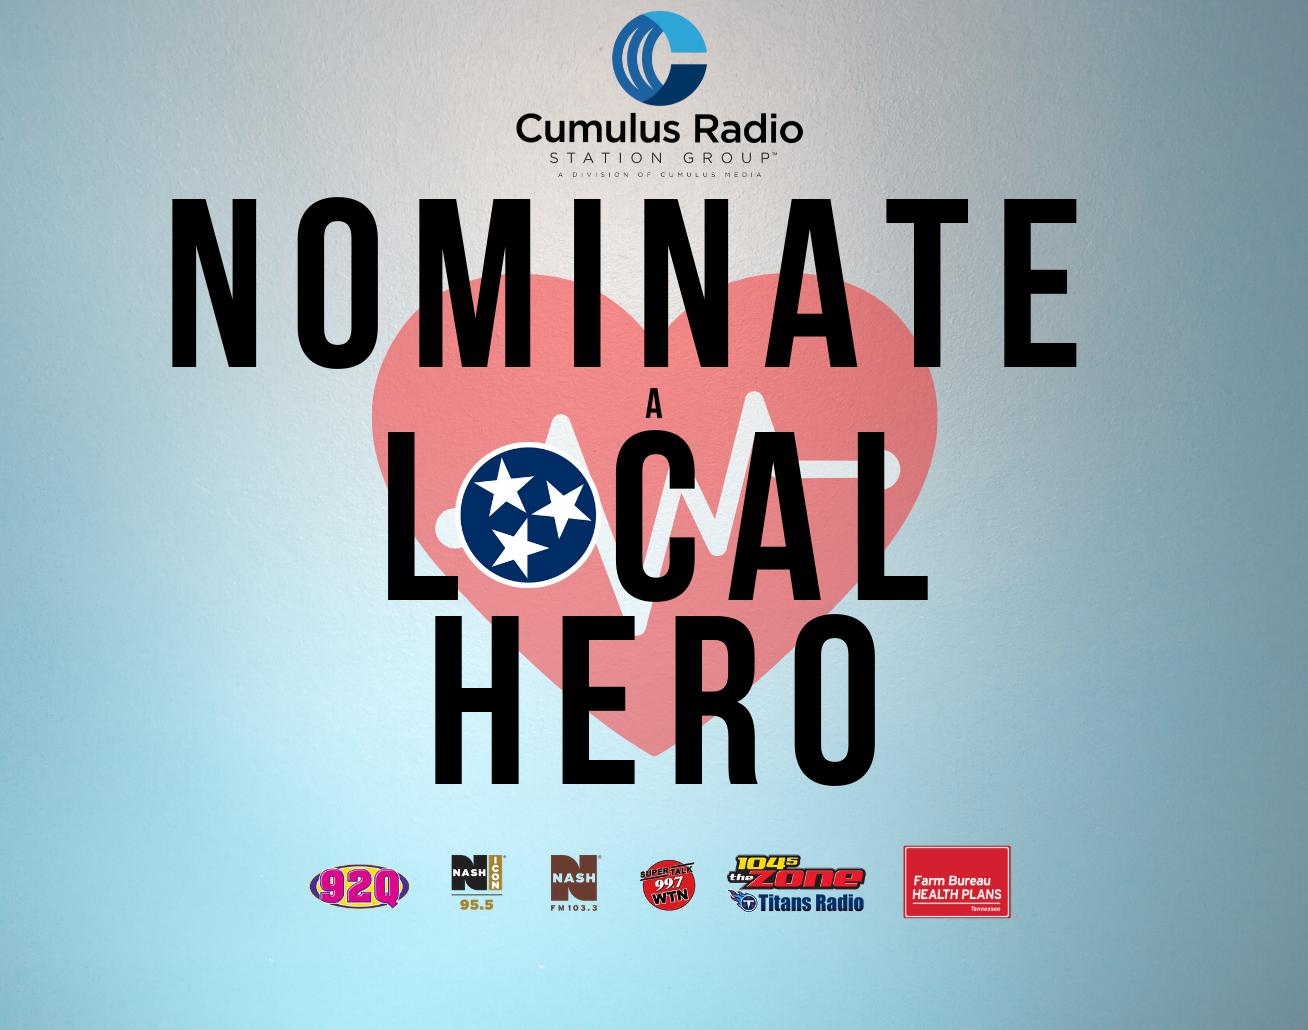 Nominate a Local Hero